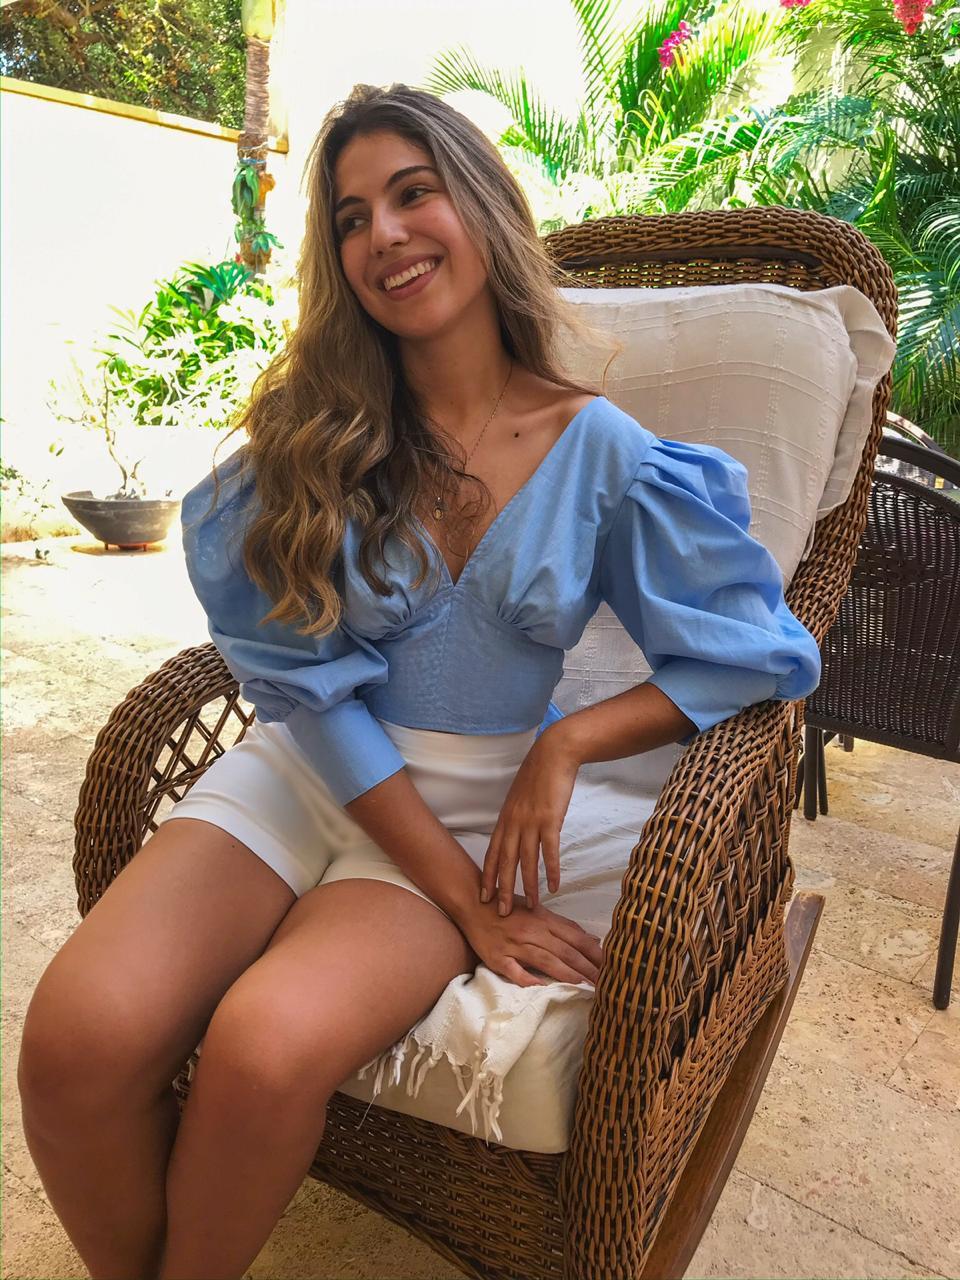 blusa-taliana-con-mangas-abullonadas-y-lazo-fabricada-en-lino-olan-con-pantalon-blanco-bota-ancha